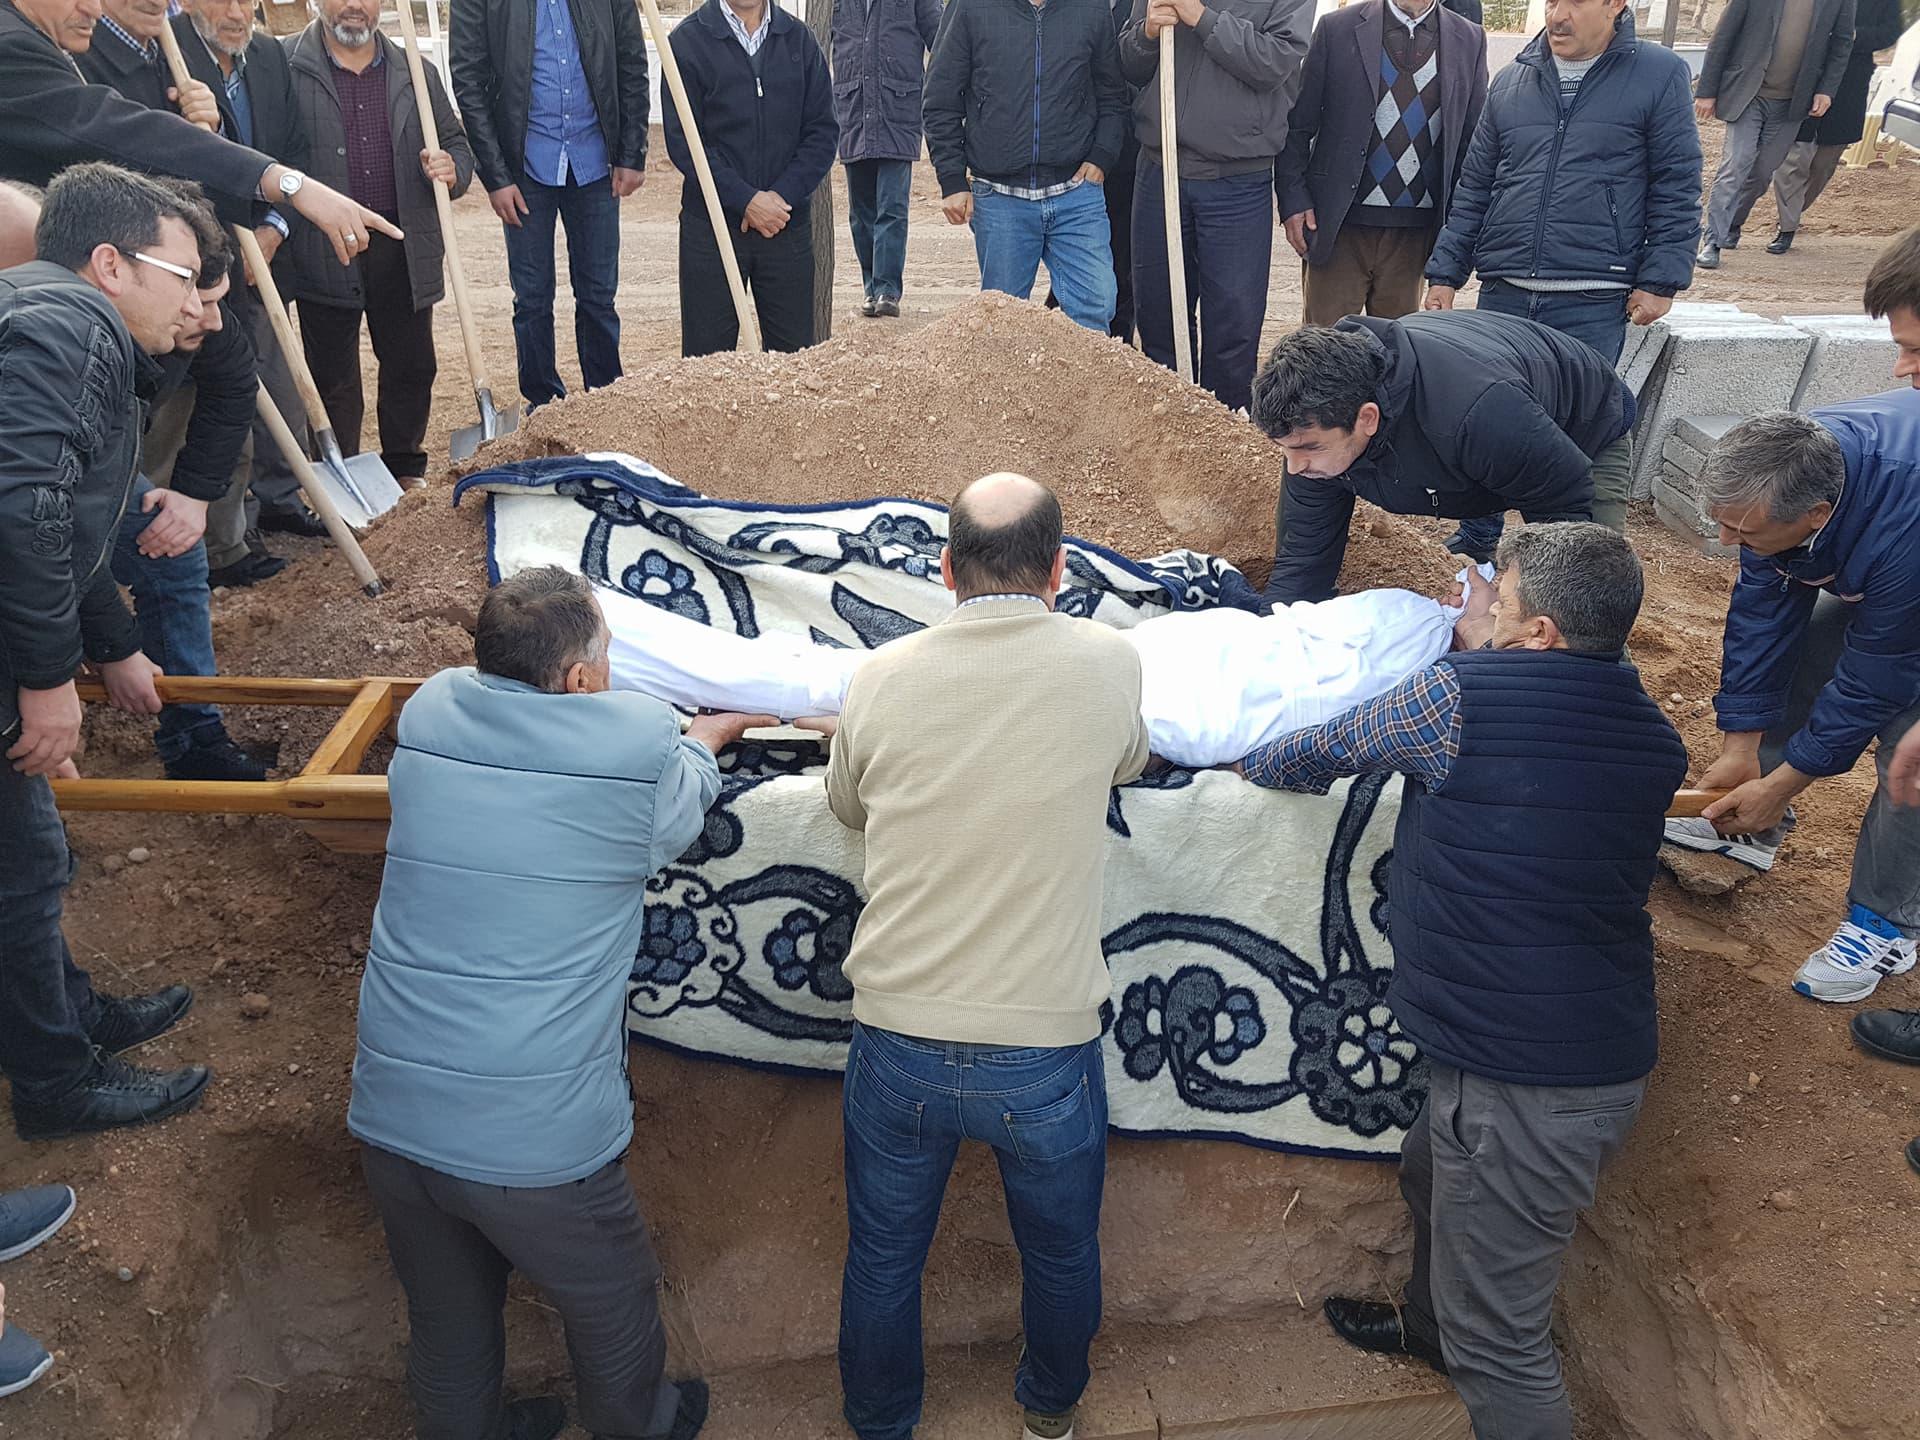 ali oğlu izzet kamacı vefat etmiştir